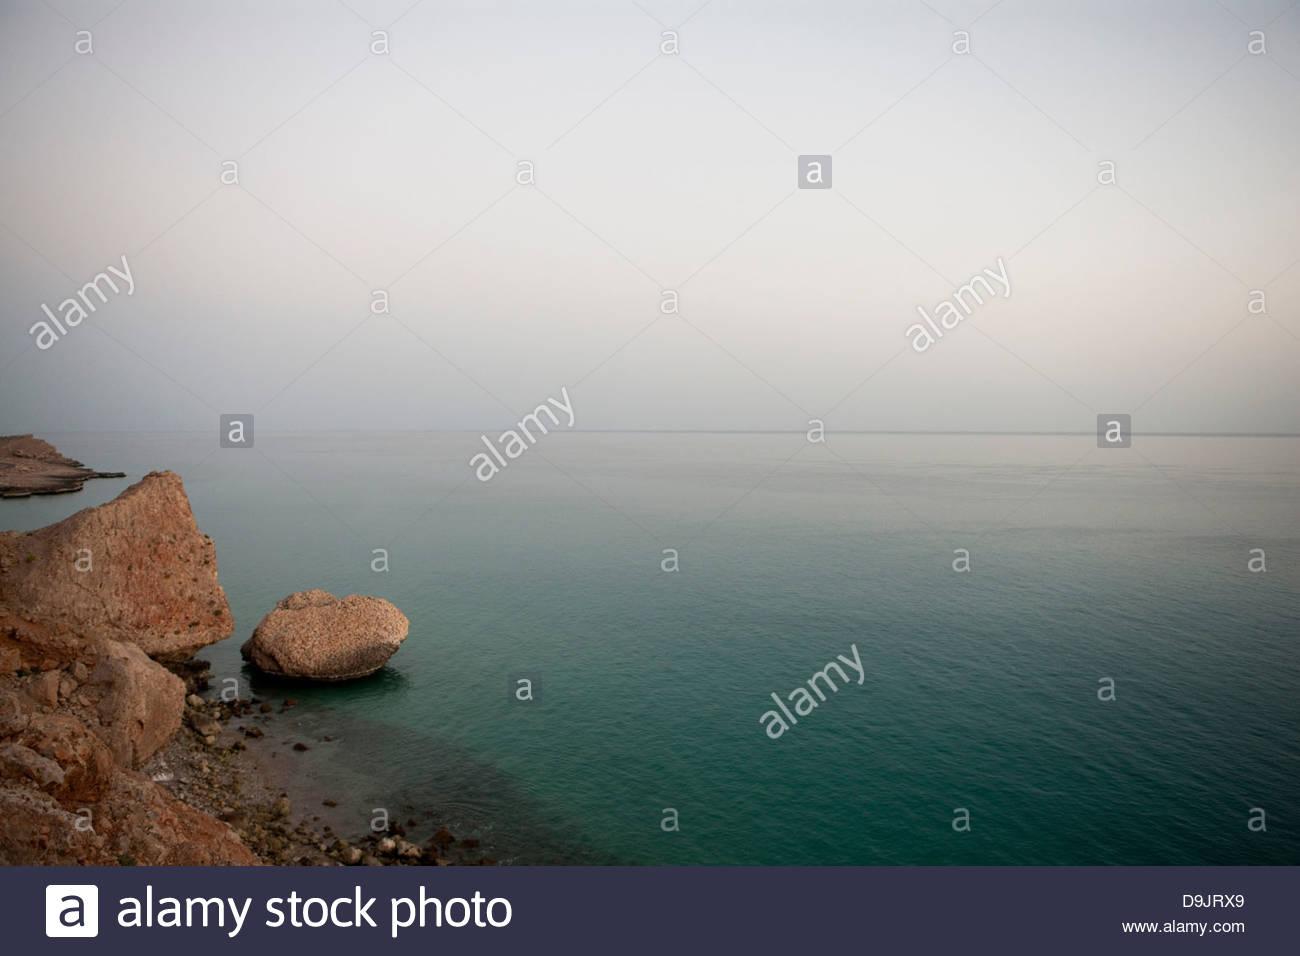 Coastline near Hadibu, Socotra, Yemen - Stock Image